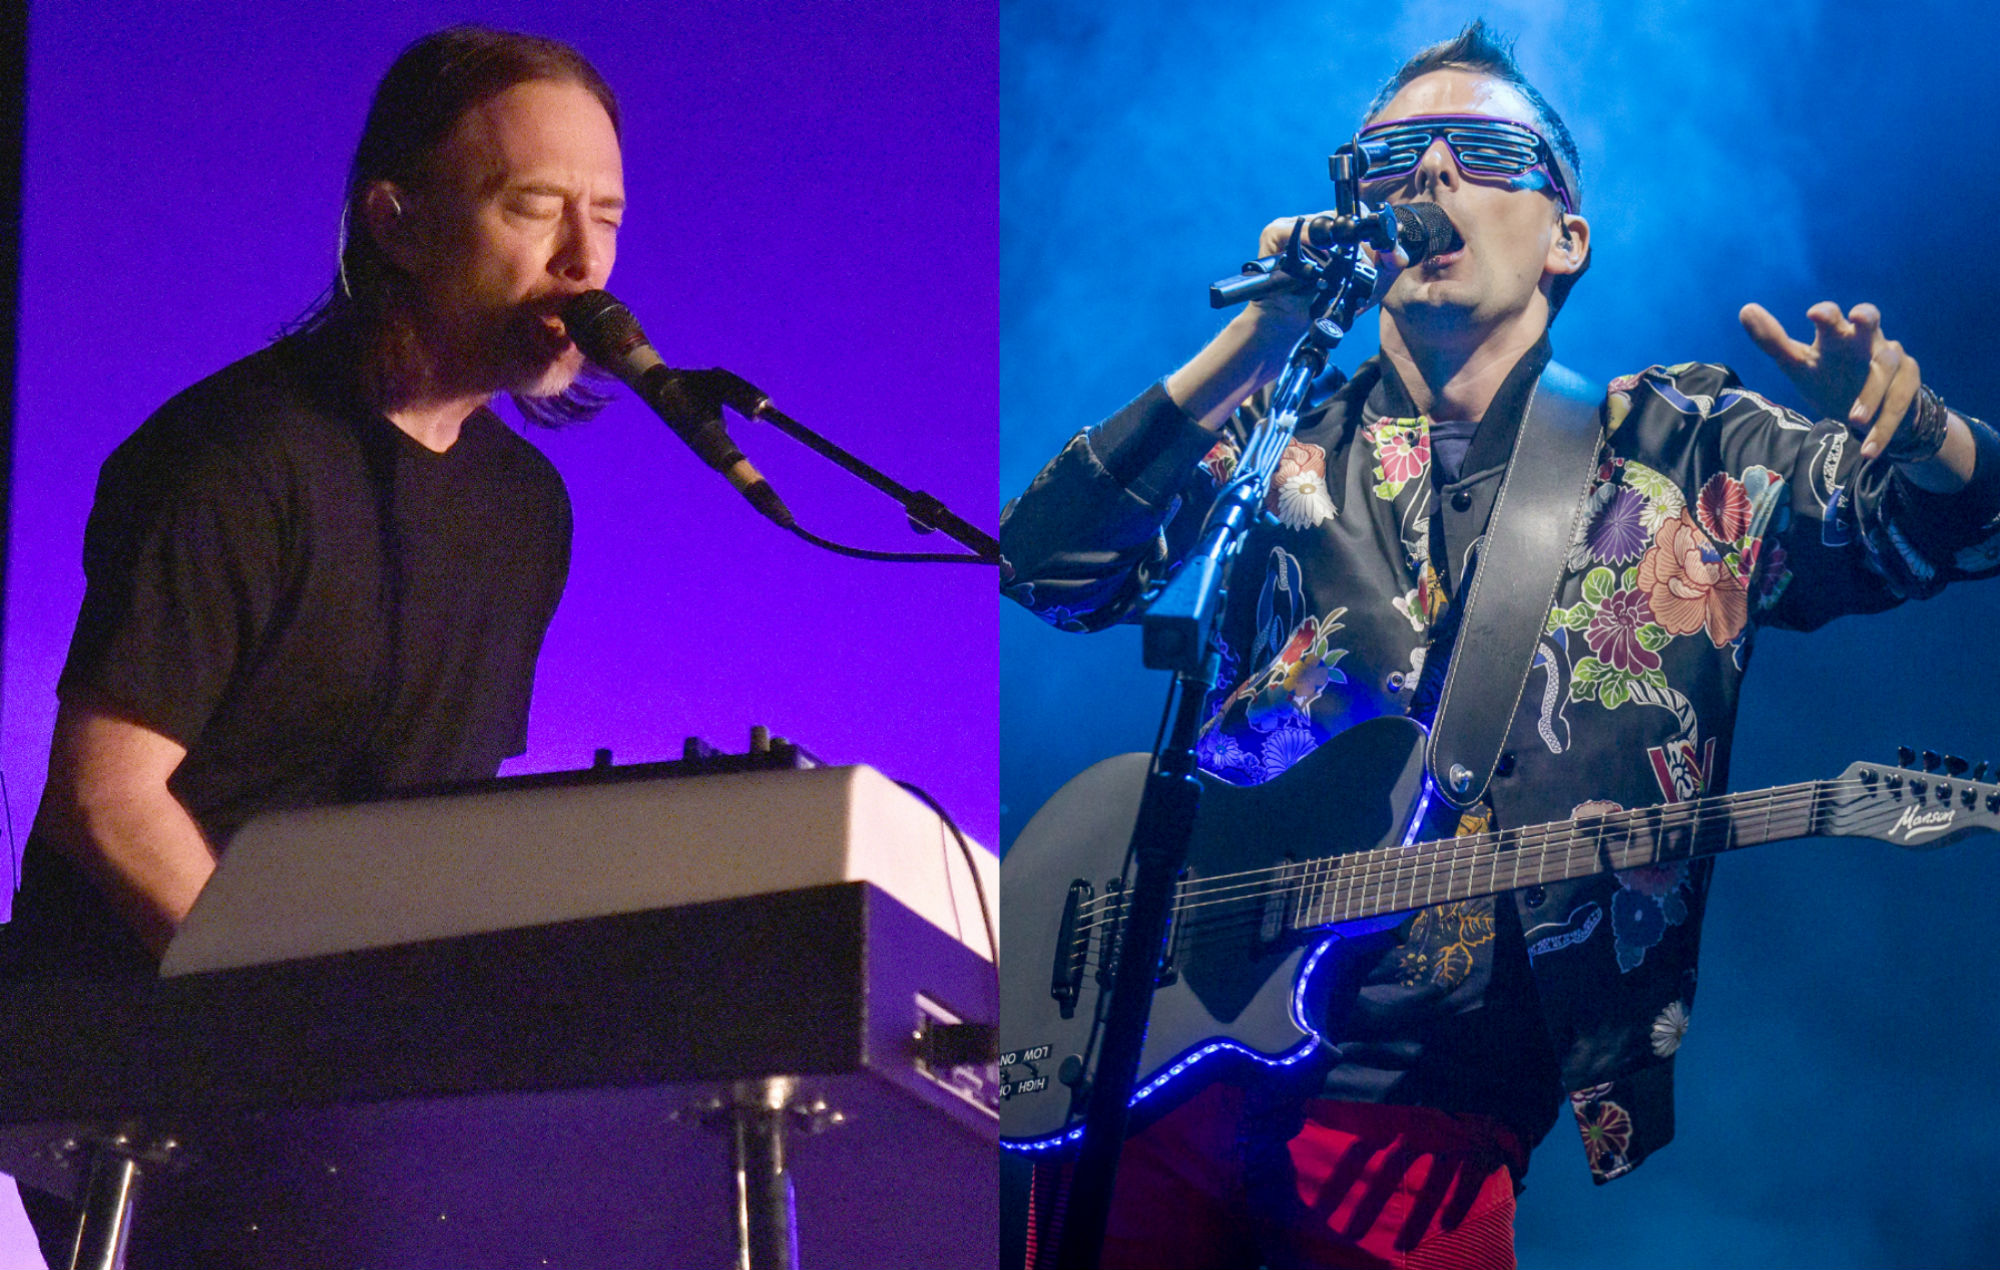 Thom Yorke / Matt Bellamy of Muse